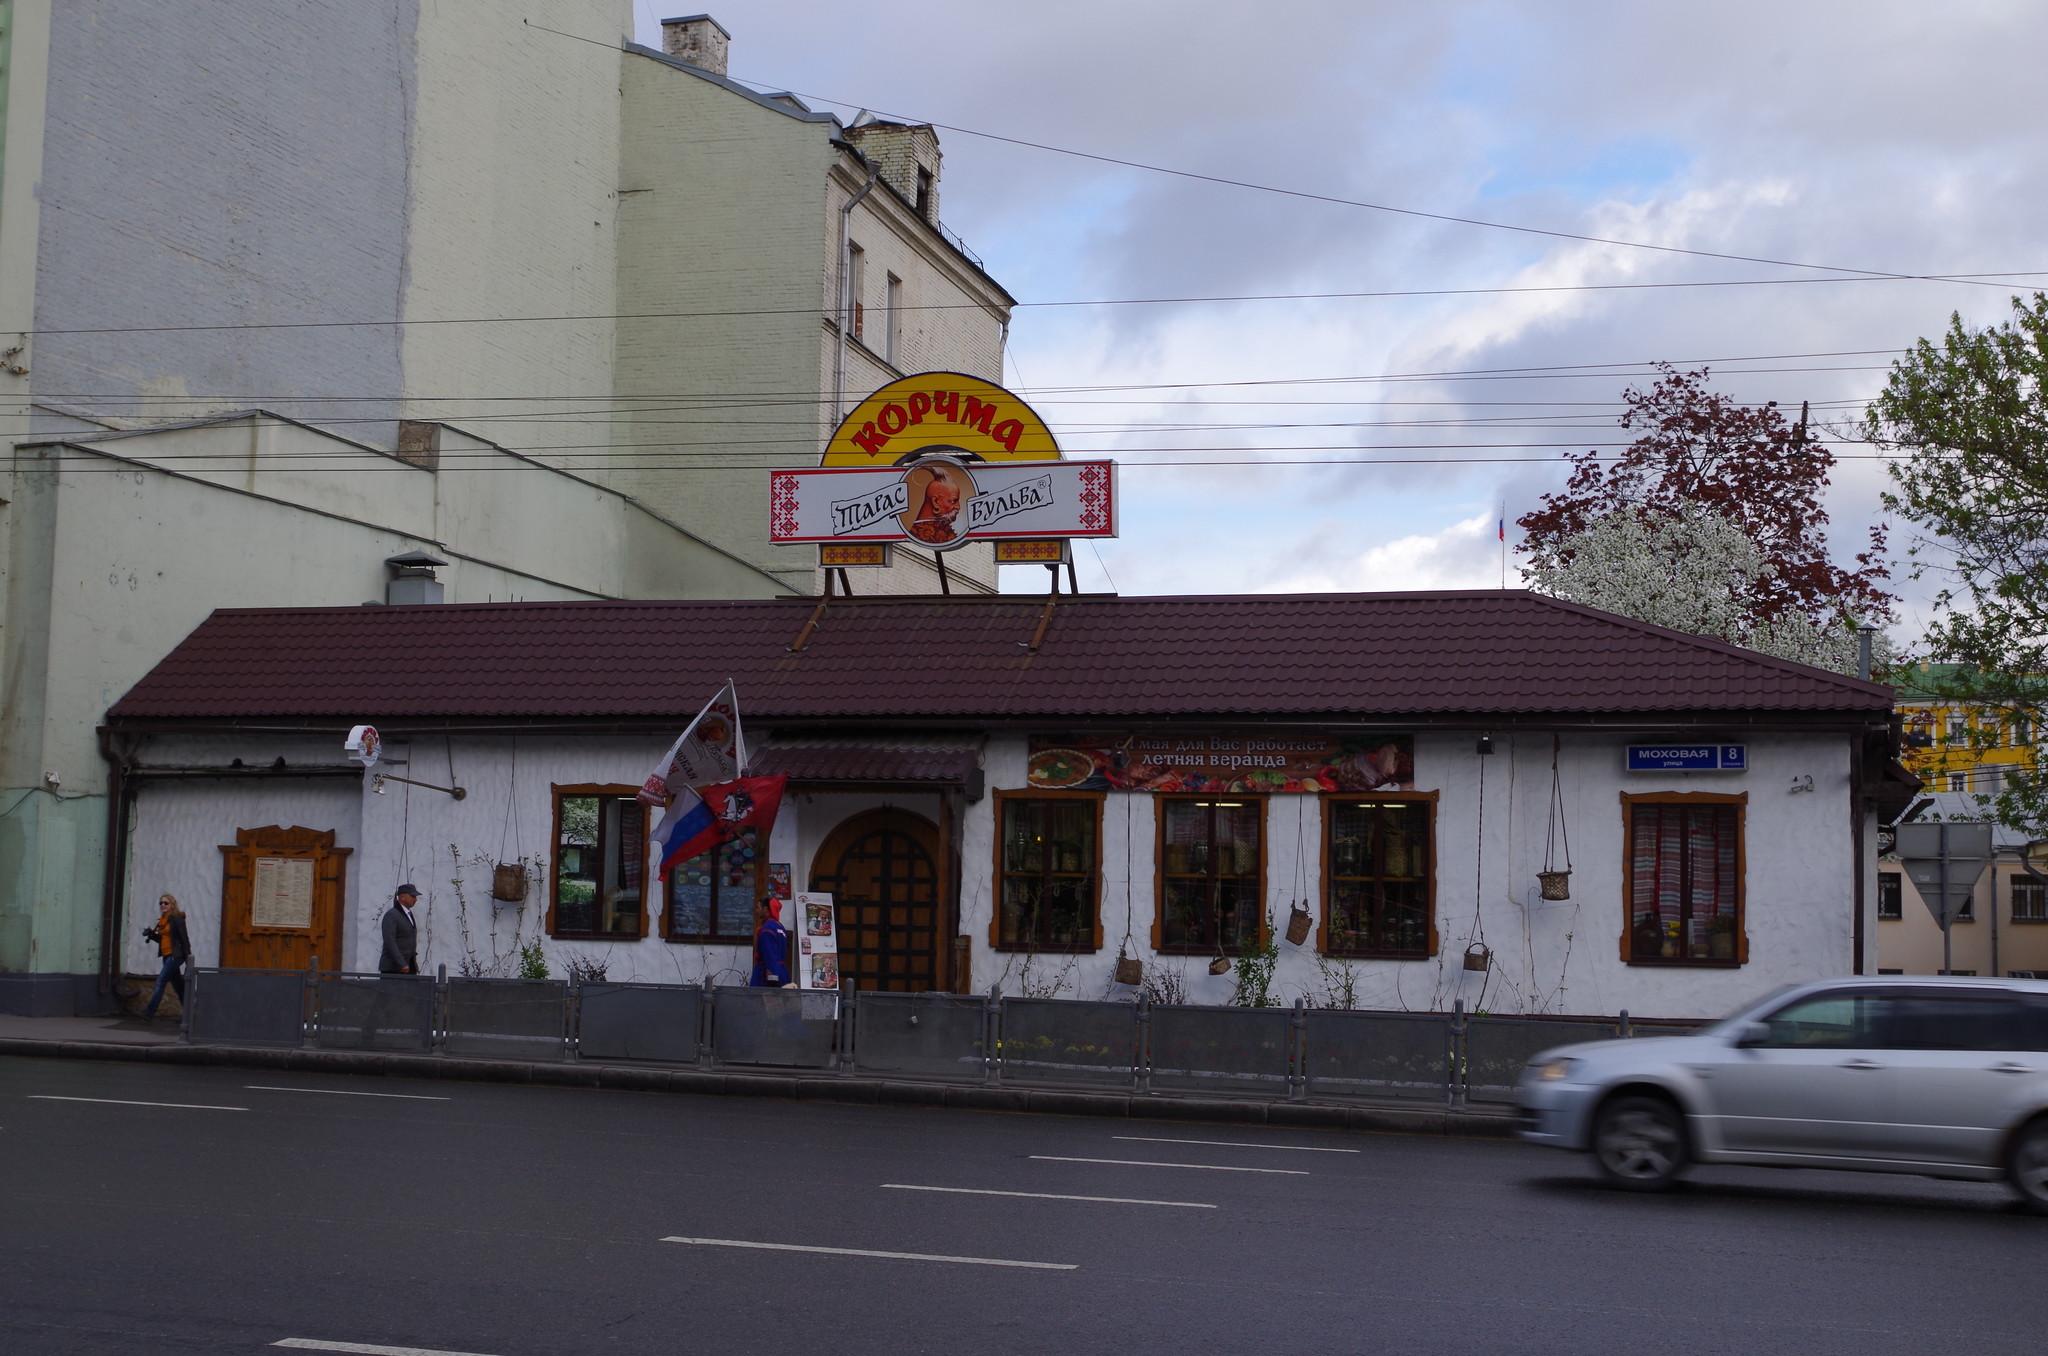 Ресторан «Корчма «Тарас Бульба» (улица Моховая, дом 8, строение 1)